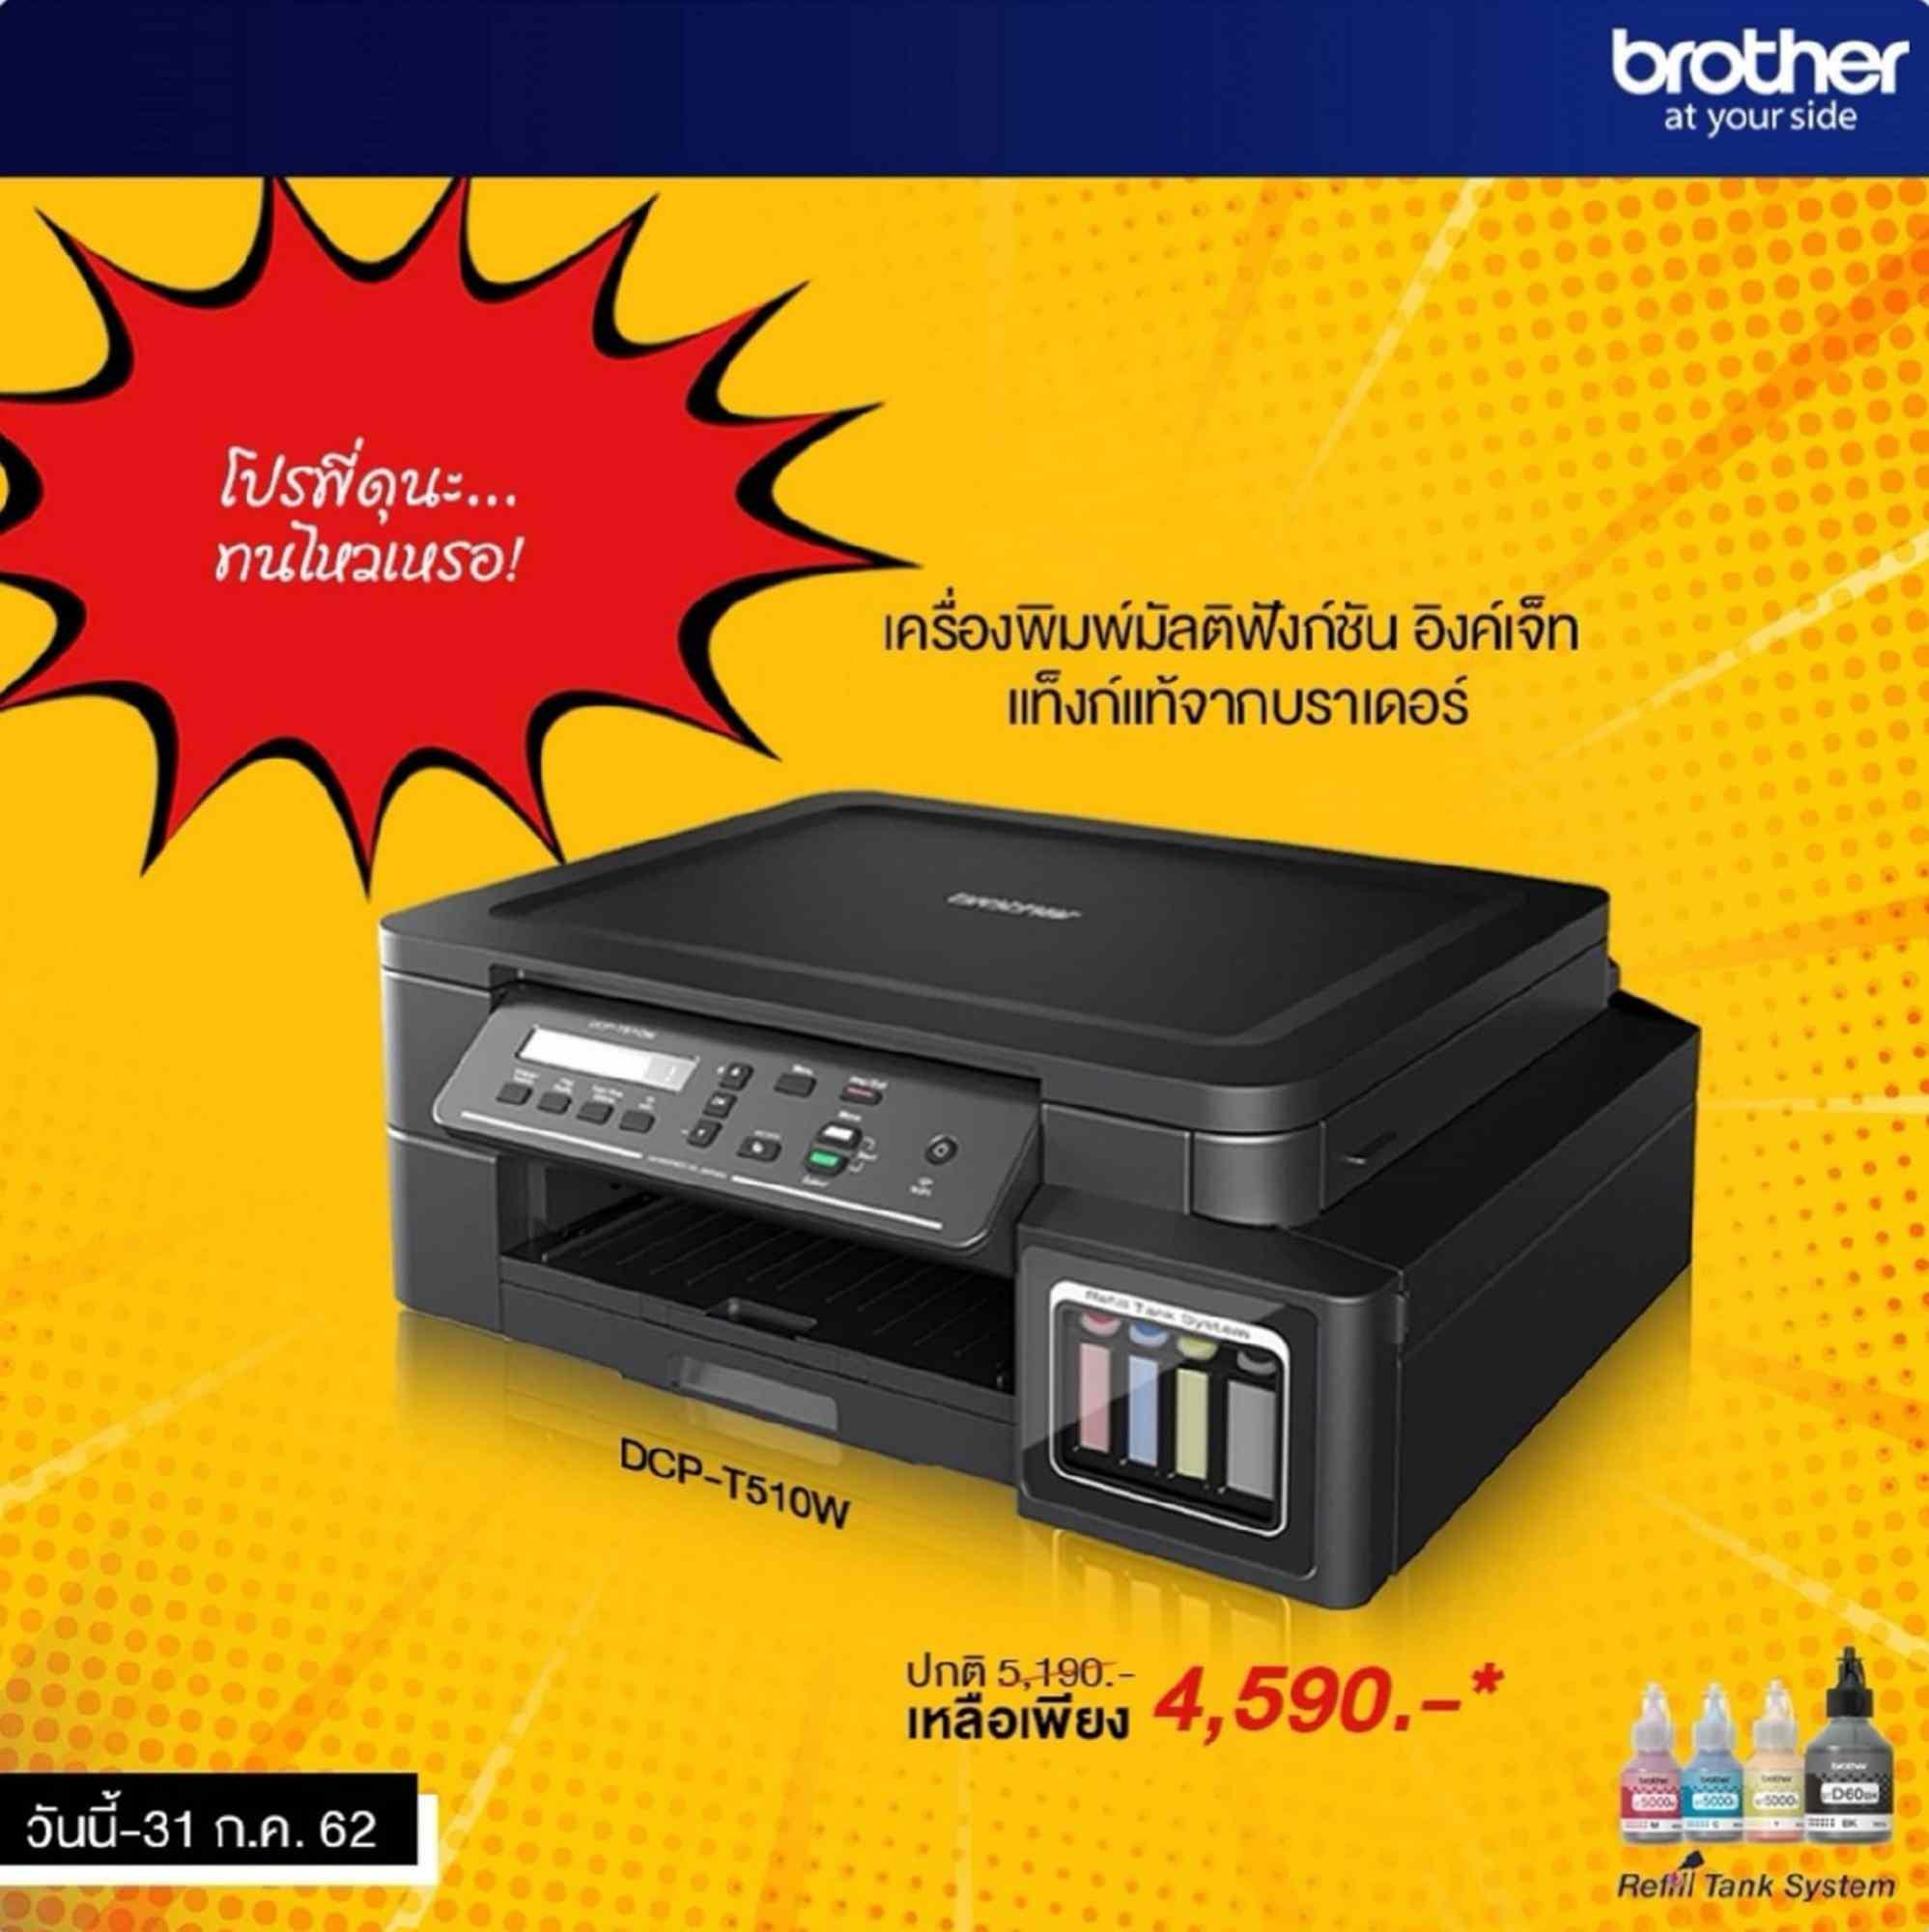 Brother จัดโปรสุดคุ้ม ให้คุณเป็นเจ้าของเครื่องพิมพ์มัลติฟังก์ชั่นอิงค์เจ็ทรุ่น DCP-T510W ในราคาพิเศษ - Brother จัดโปรสุดคุ้ม ให้คุณเป็นเจ้าของเครื่องพิมพ์มัลติฟังก์ชั่นอิงค์เจ็ทรุ่น DCP-T510W ในราคาพิเศษ